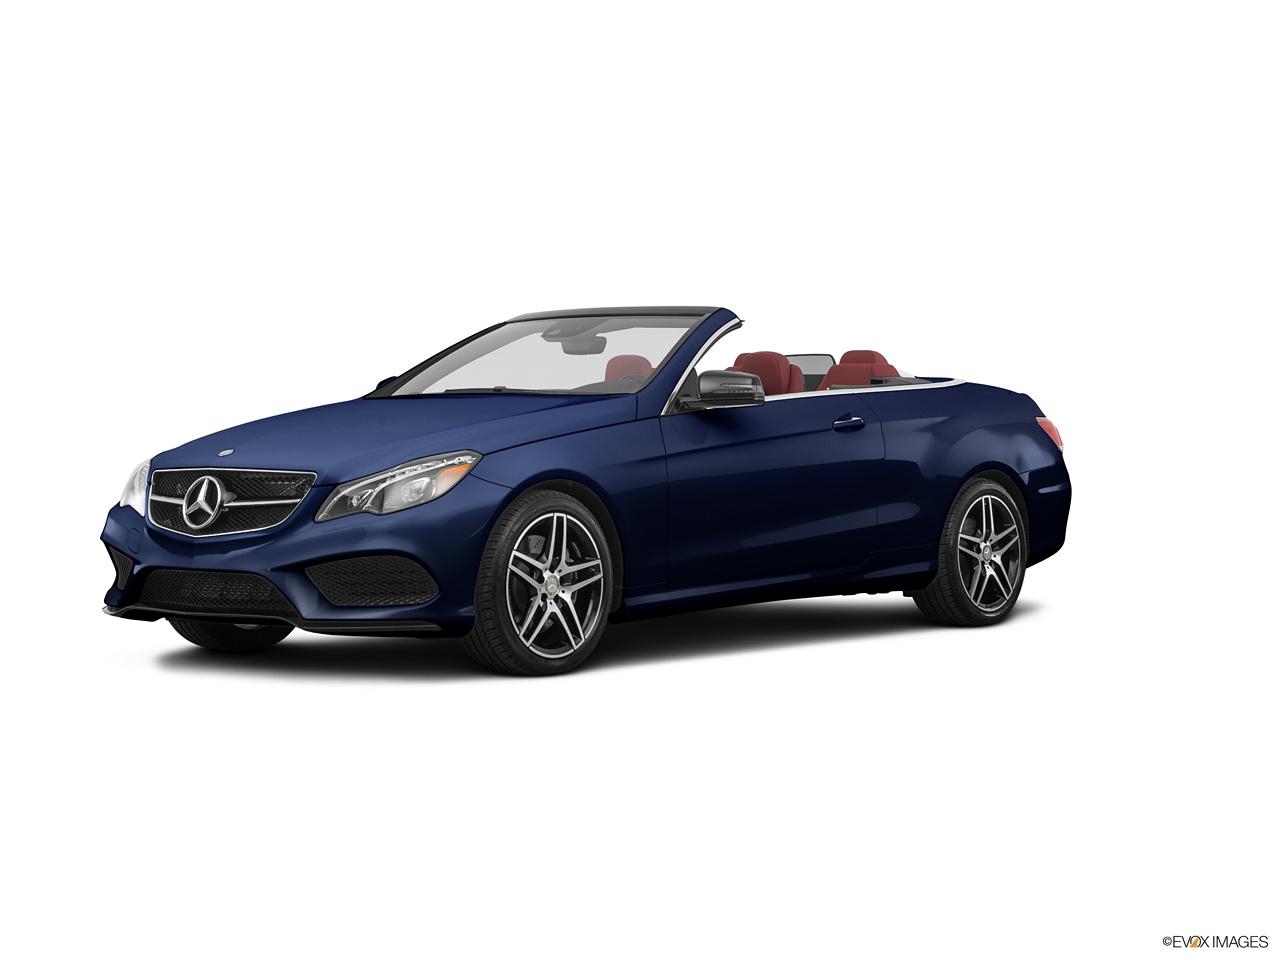 Car Pictures List For Mercedes Benz E Class Cabriolet 2016